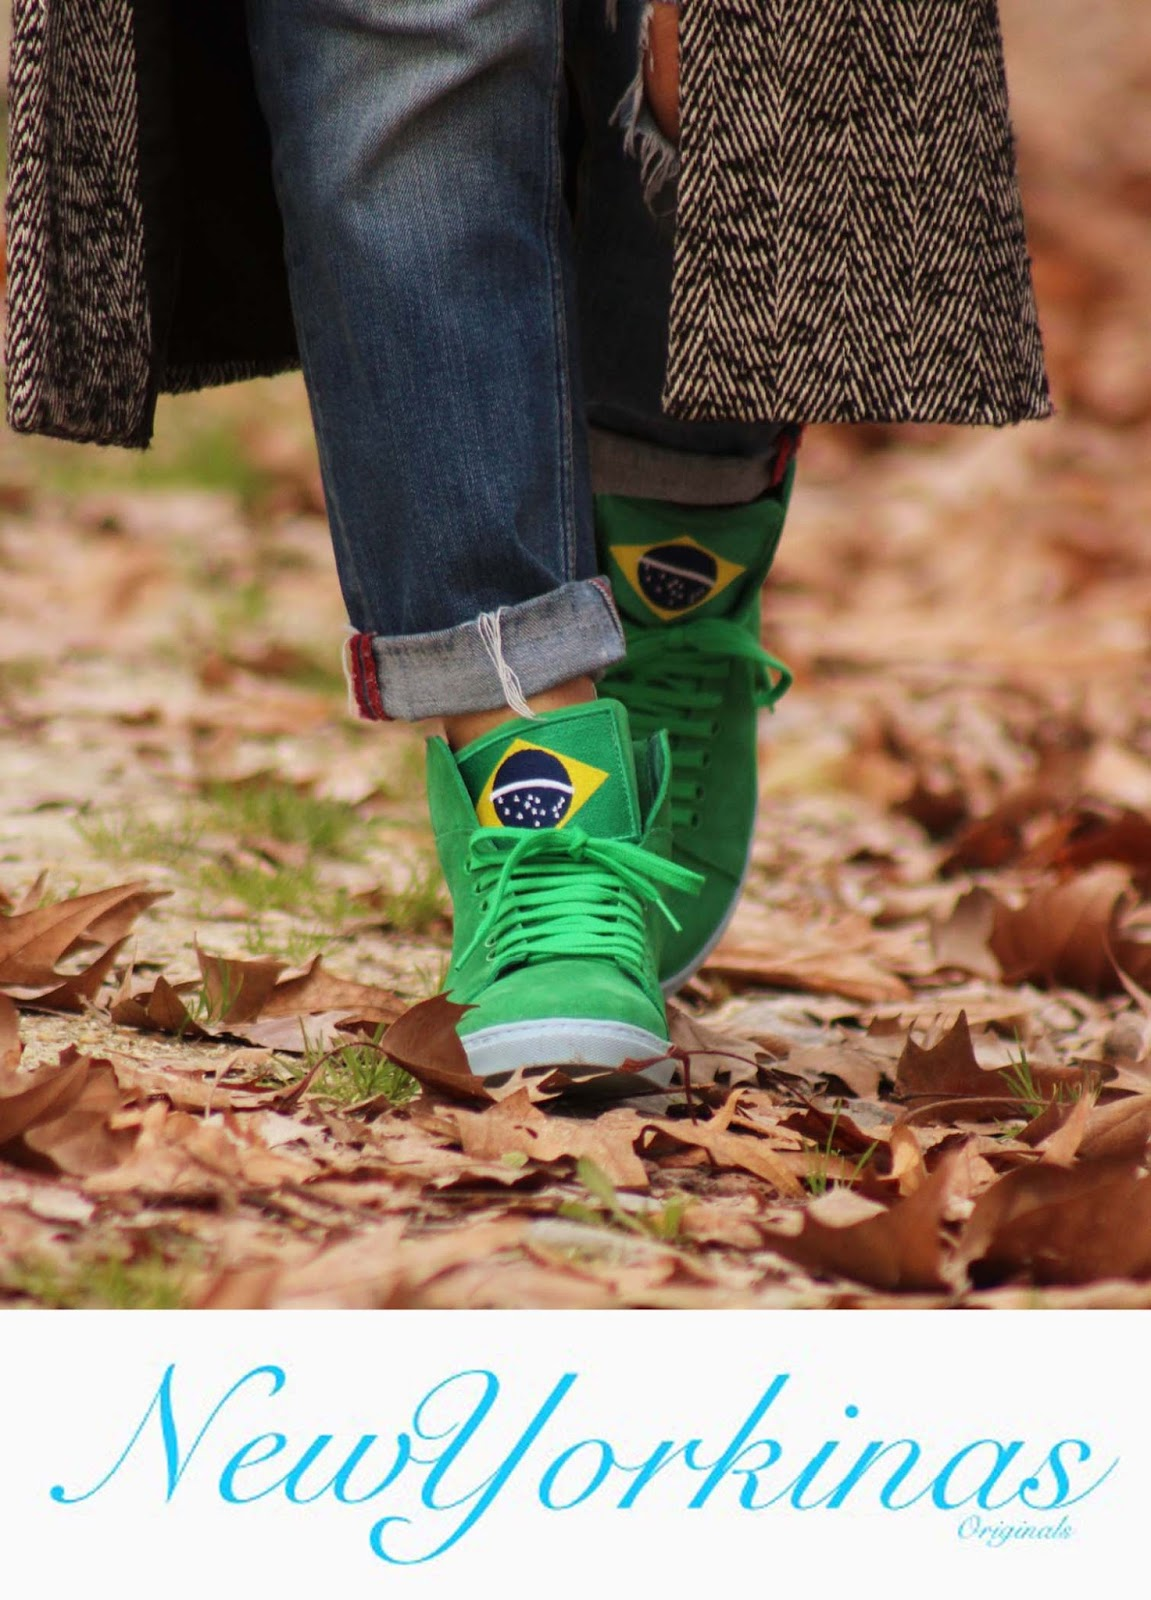 Eniwhere Fashion - sneakers - NewYorkinas Originals